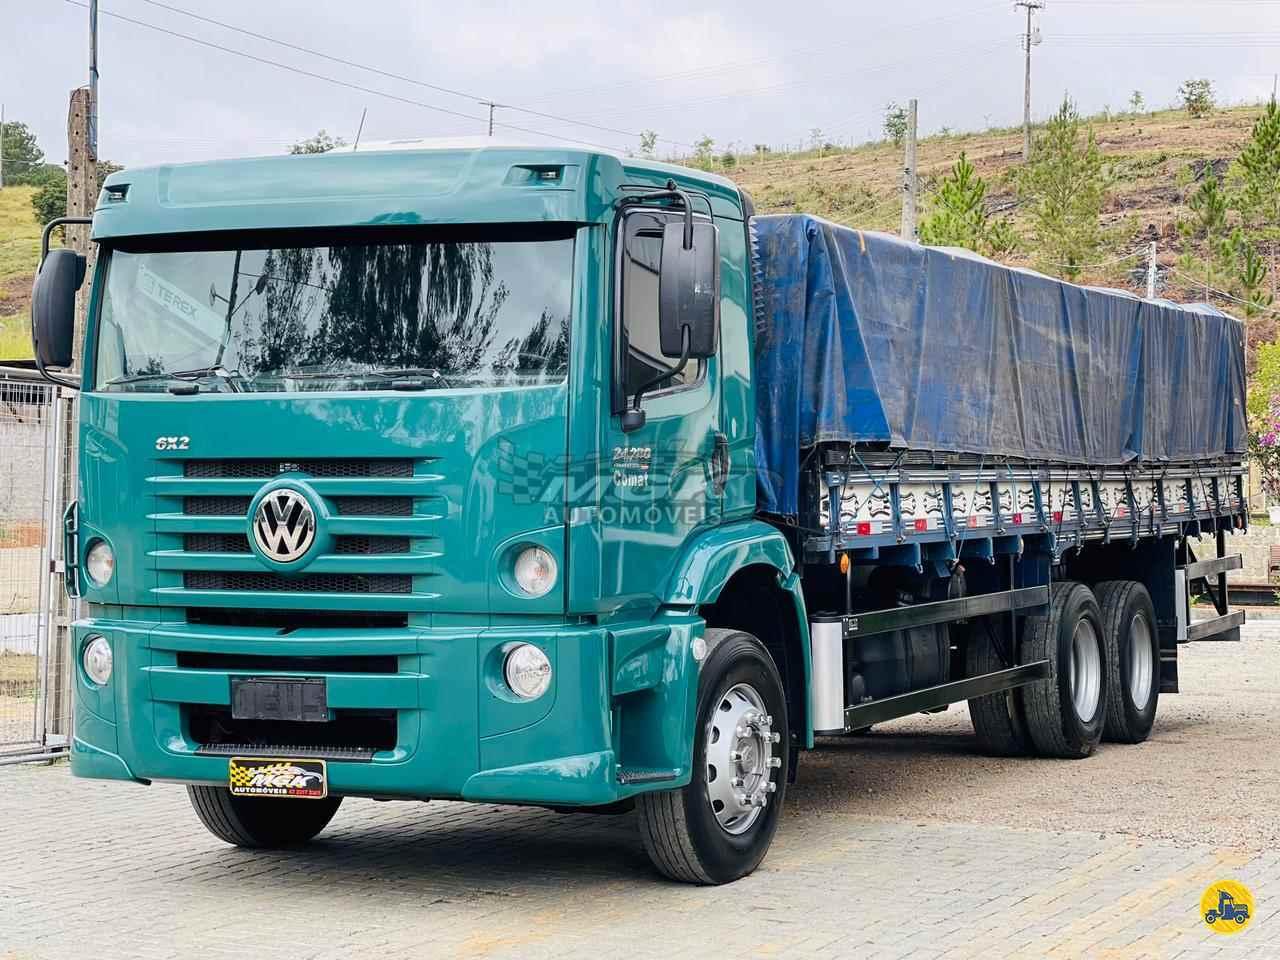 CAMINHAO VOLKSWAGEN VW 24280 Graneleiro Truck 6x2 MGK Automóveis IBIRAMA SANTA CATARINA SC